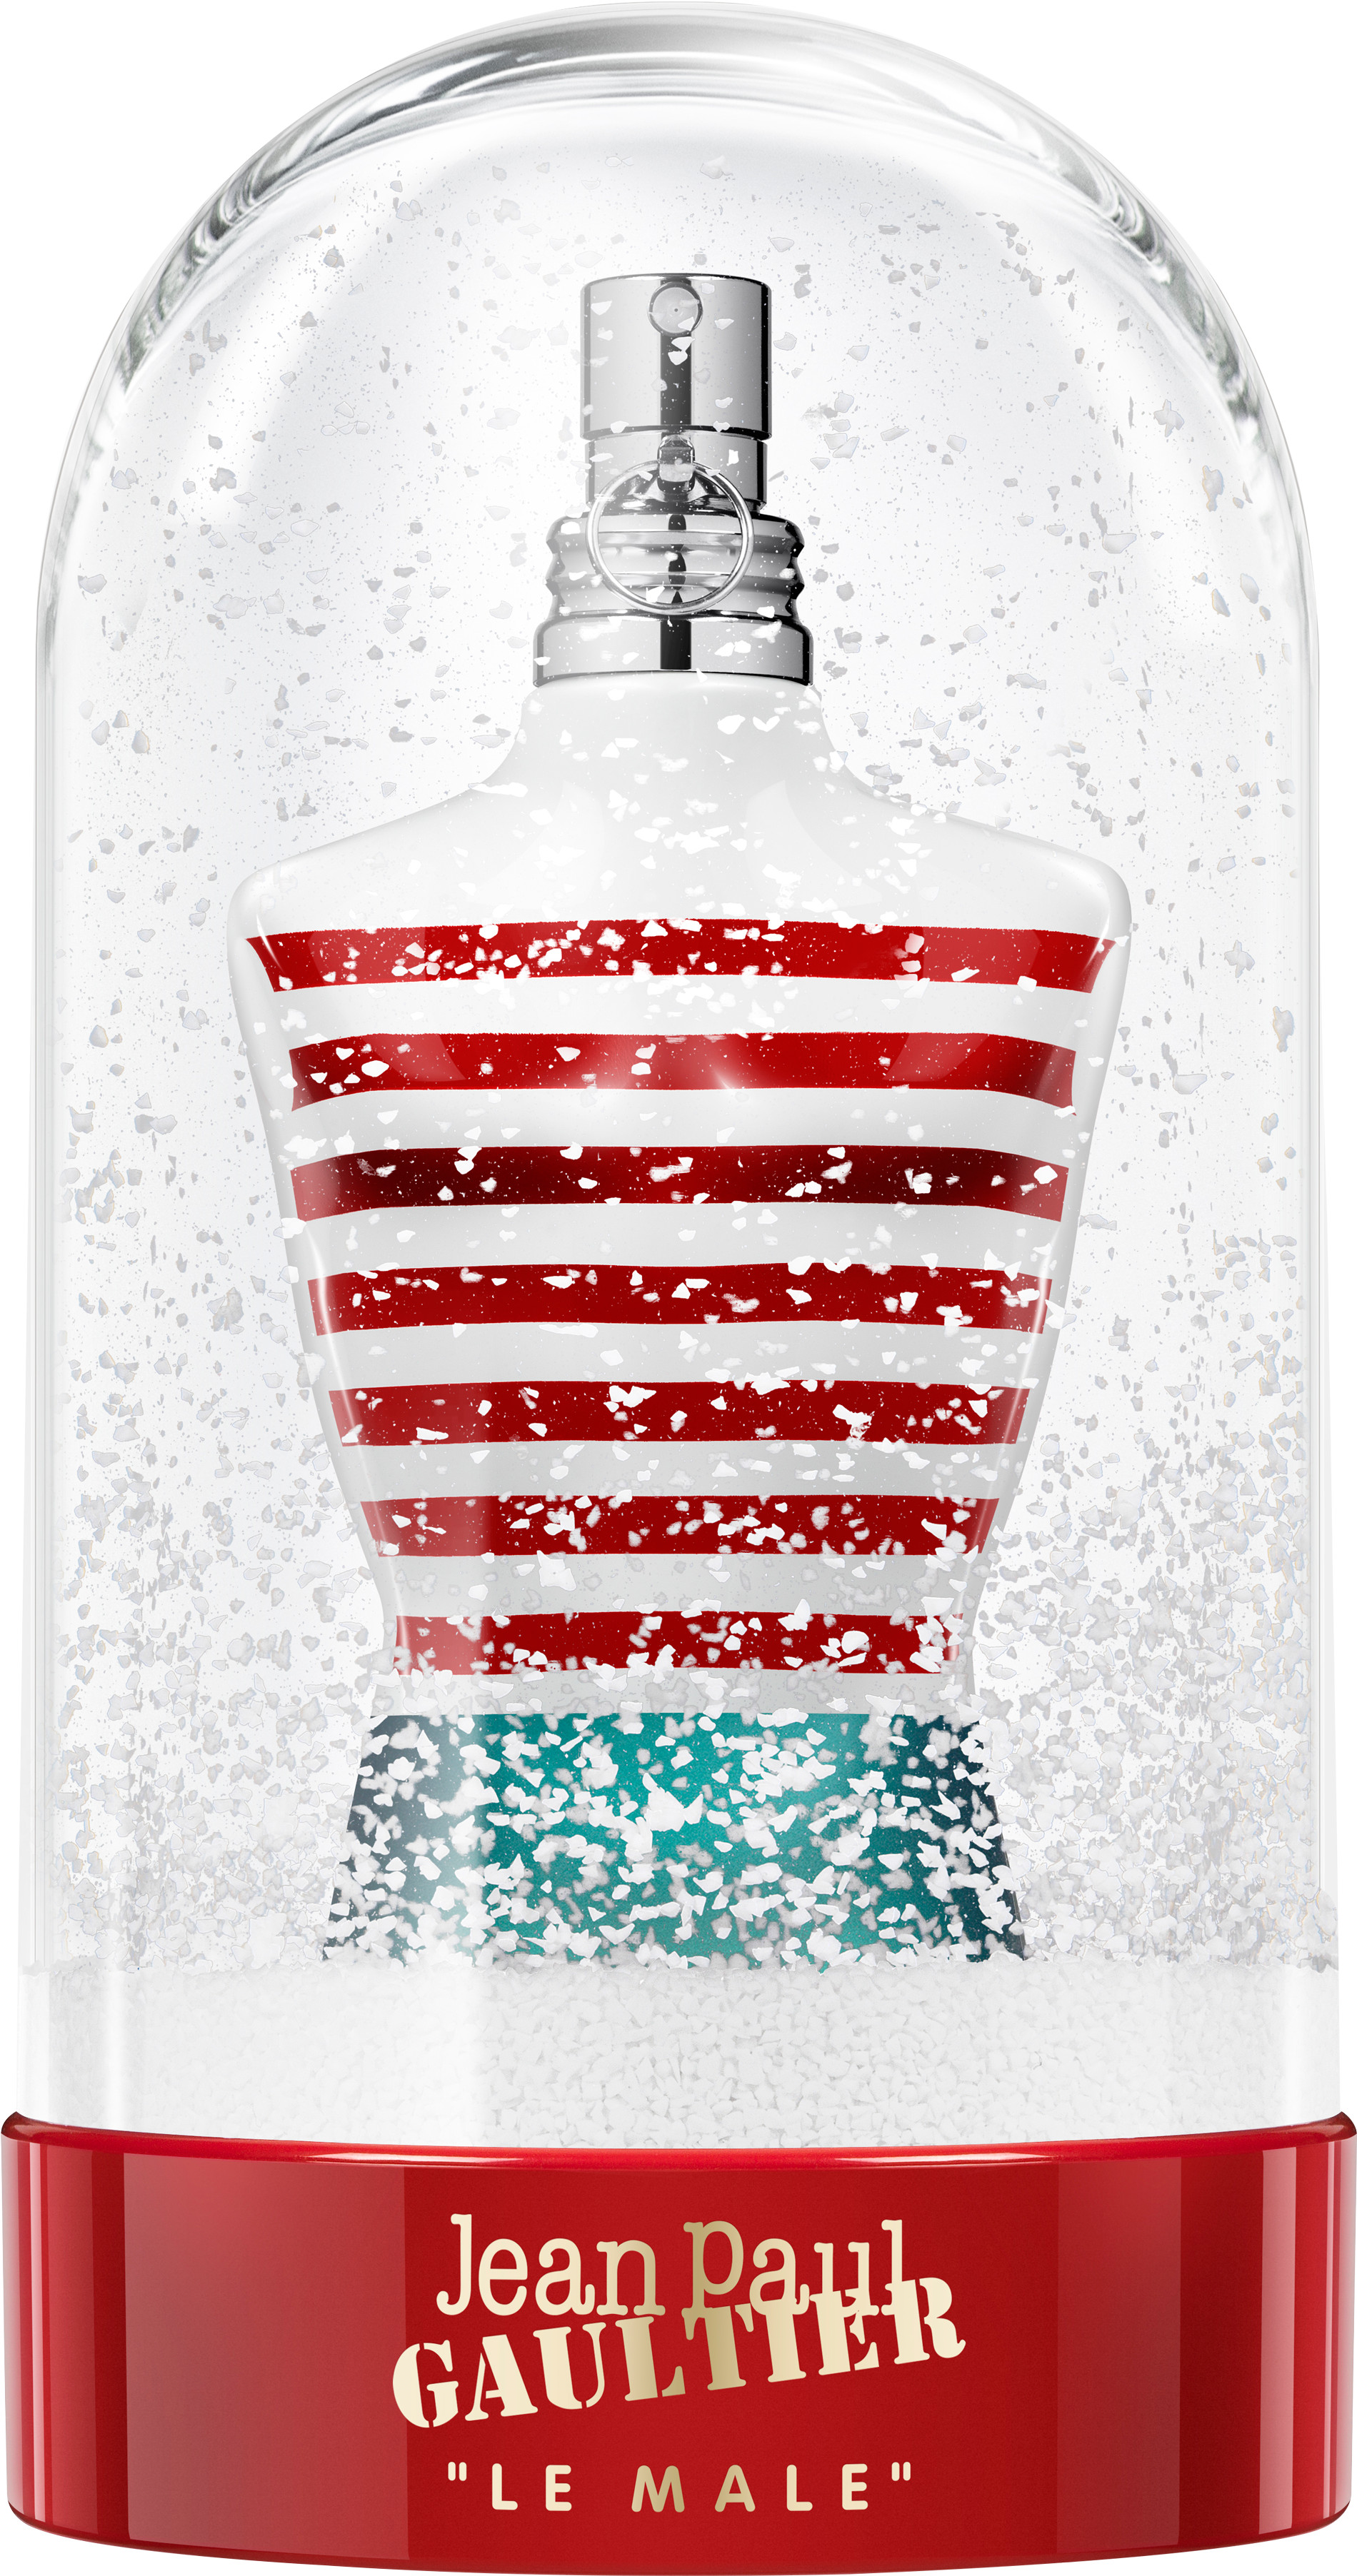 Classique Toilette Eau De 'crazy Gaultier Paul Jean Tree' Collector EH2WID9eYb